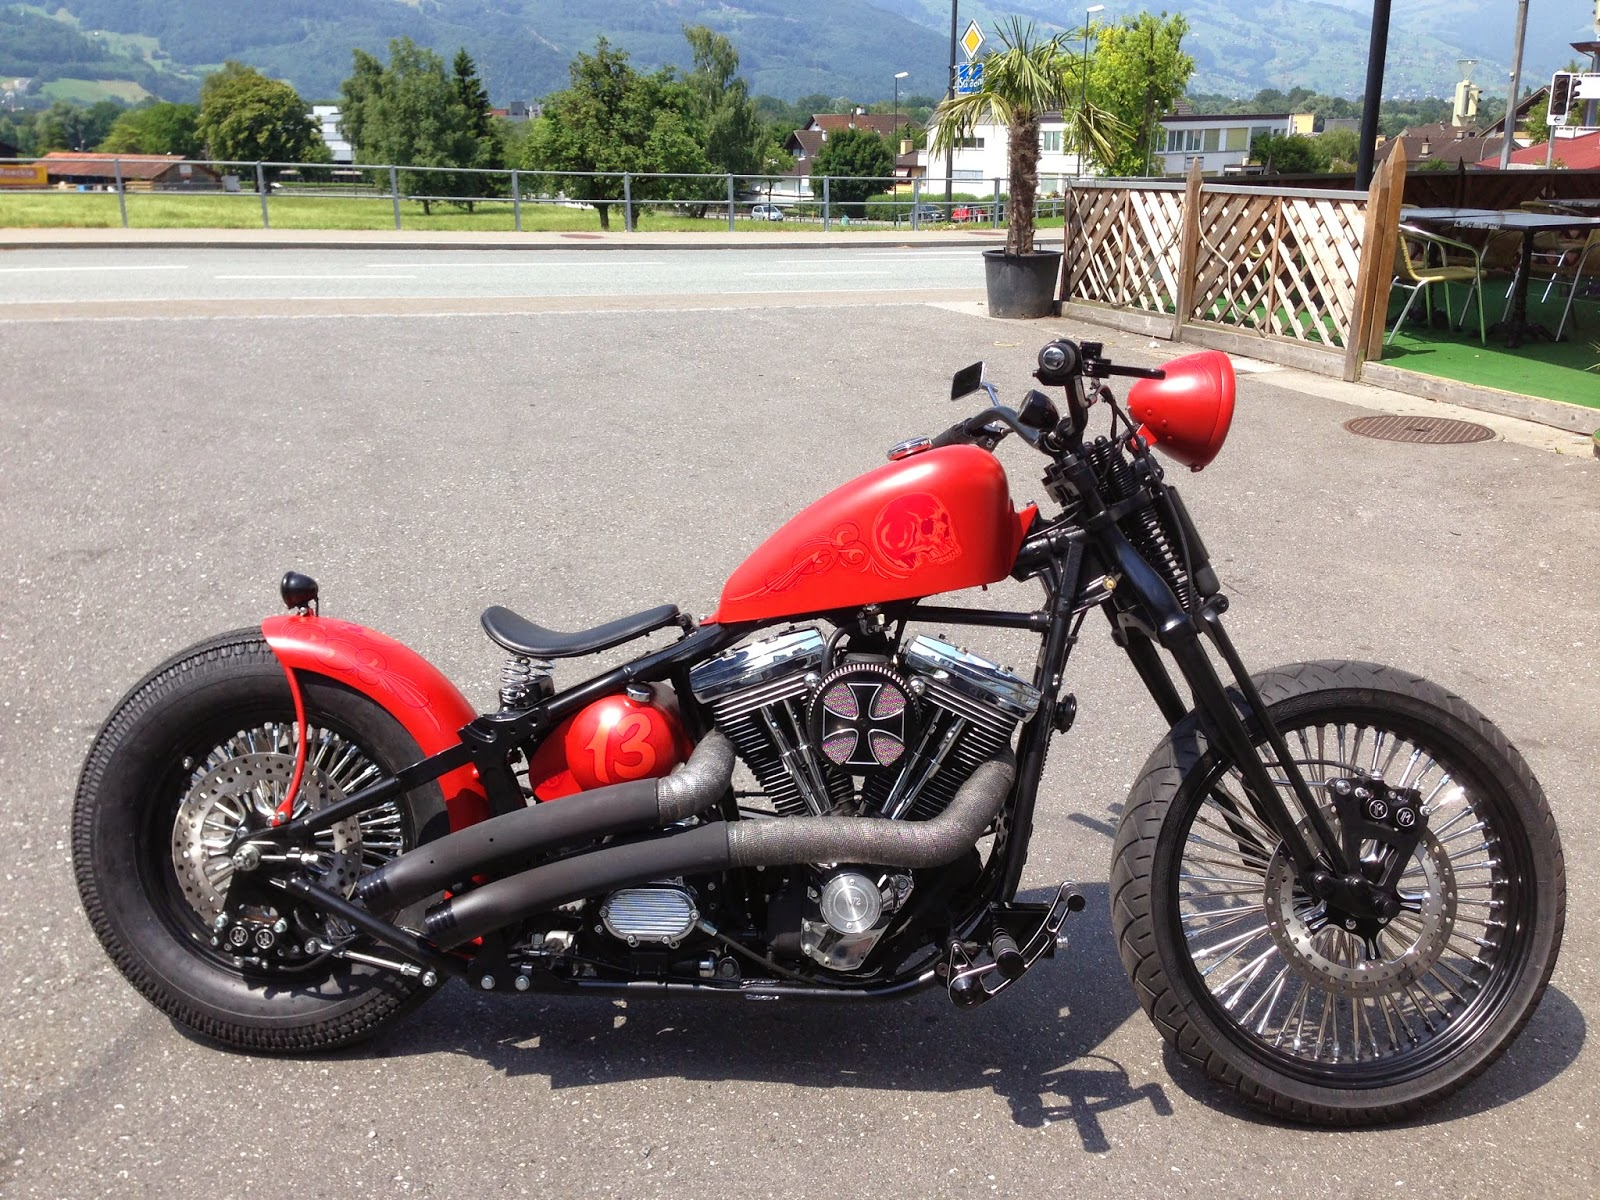 Harley Davidson Fatboy 1993 By Bobber FL Motorcycles